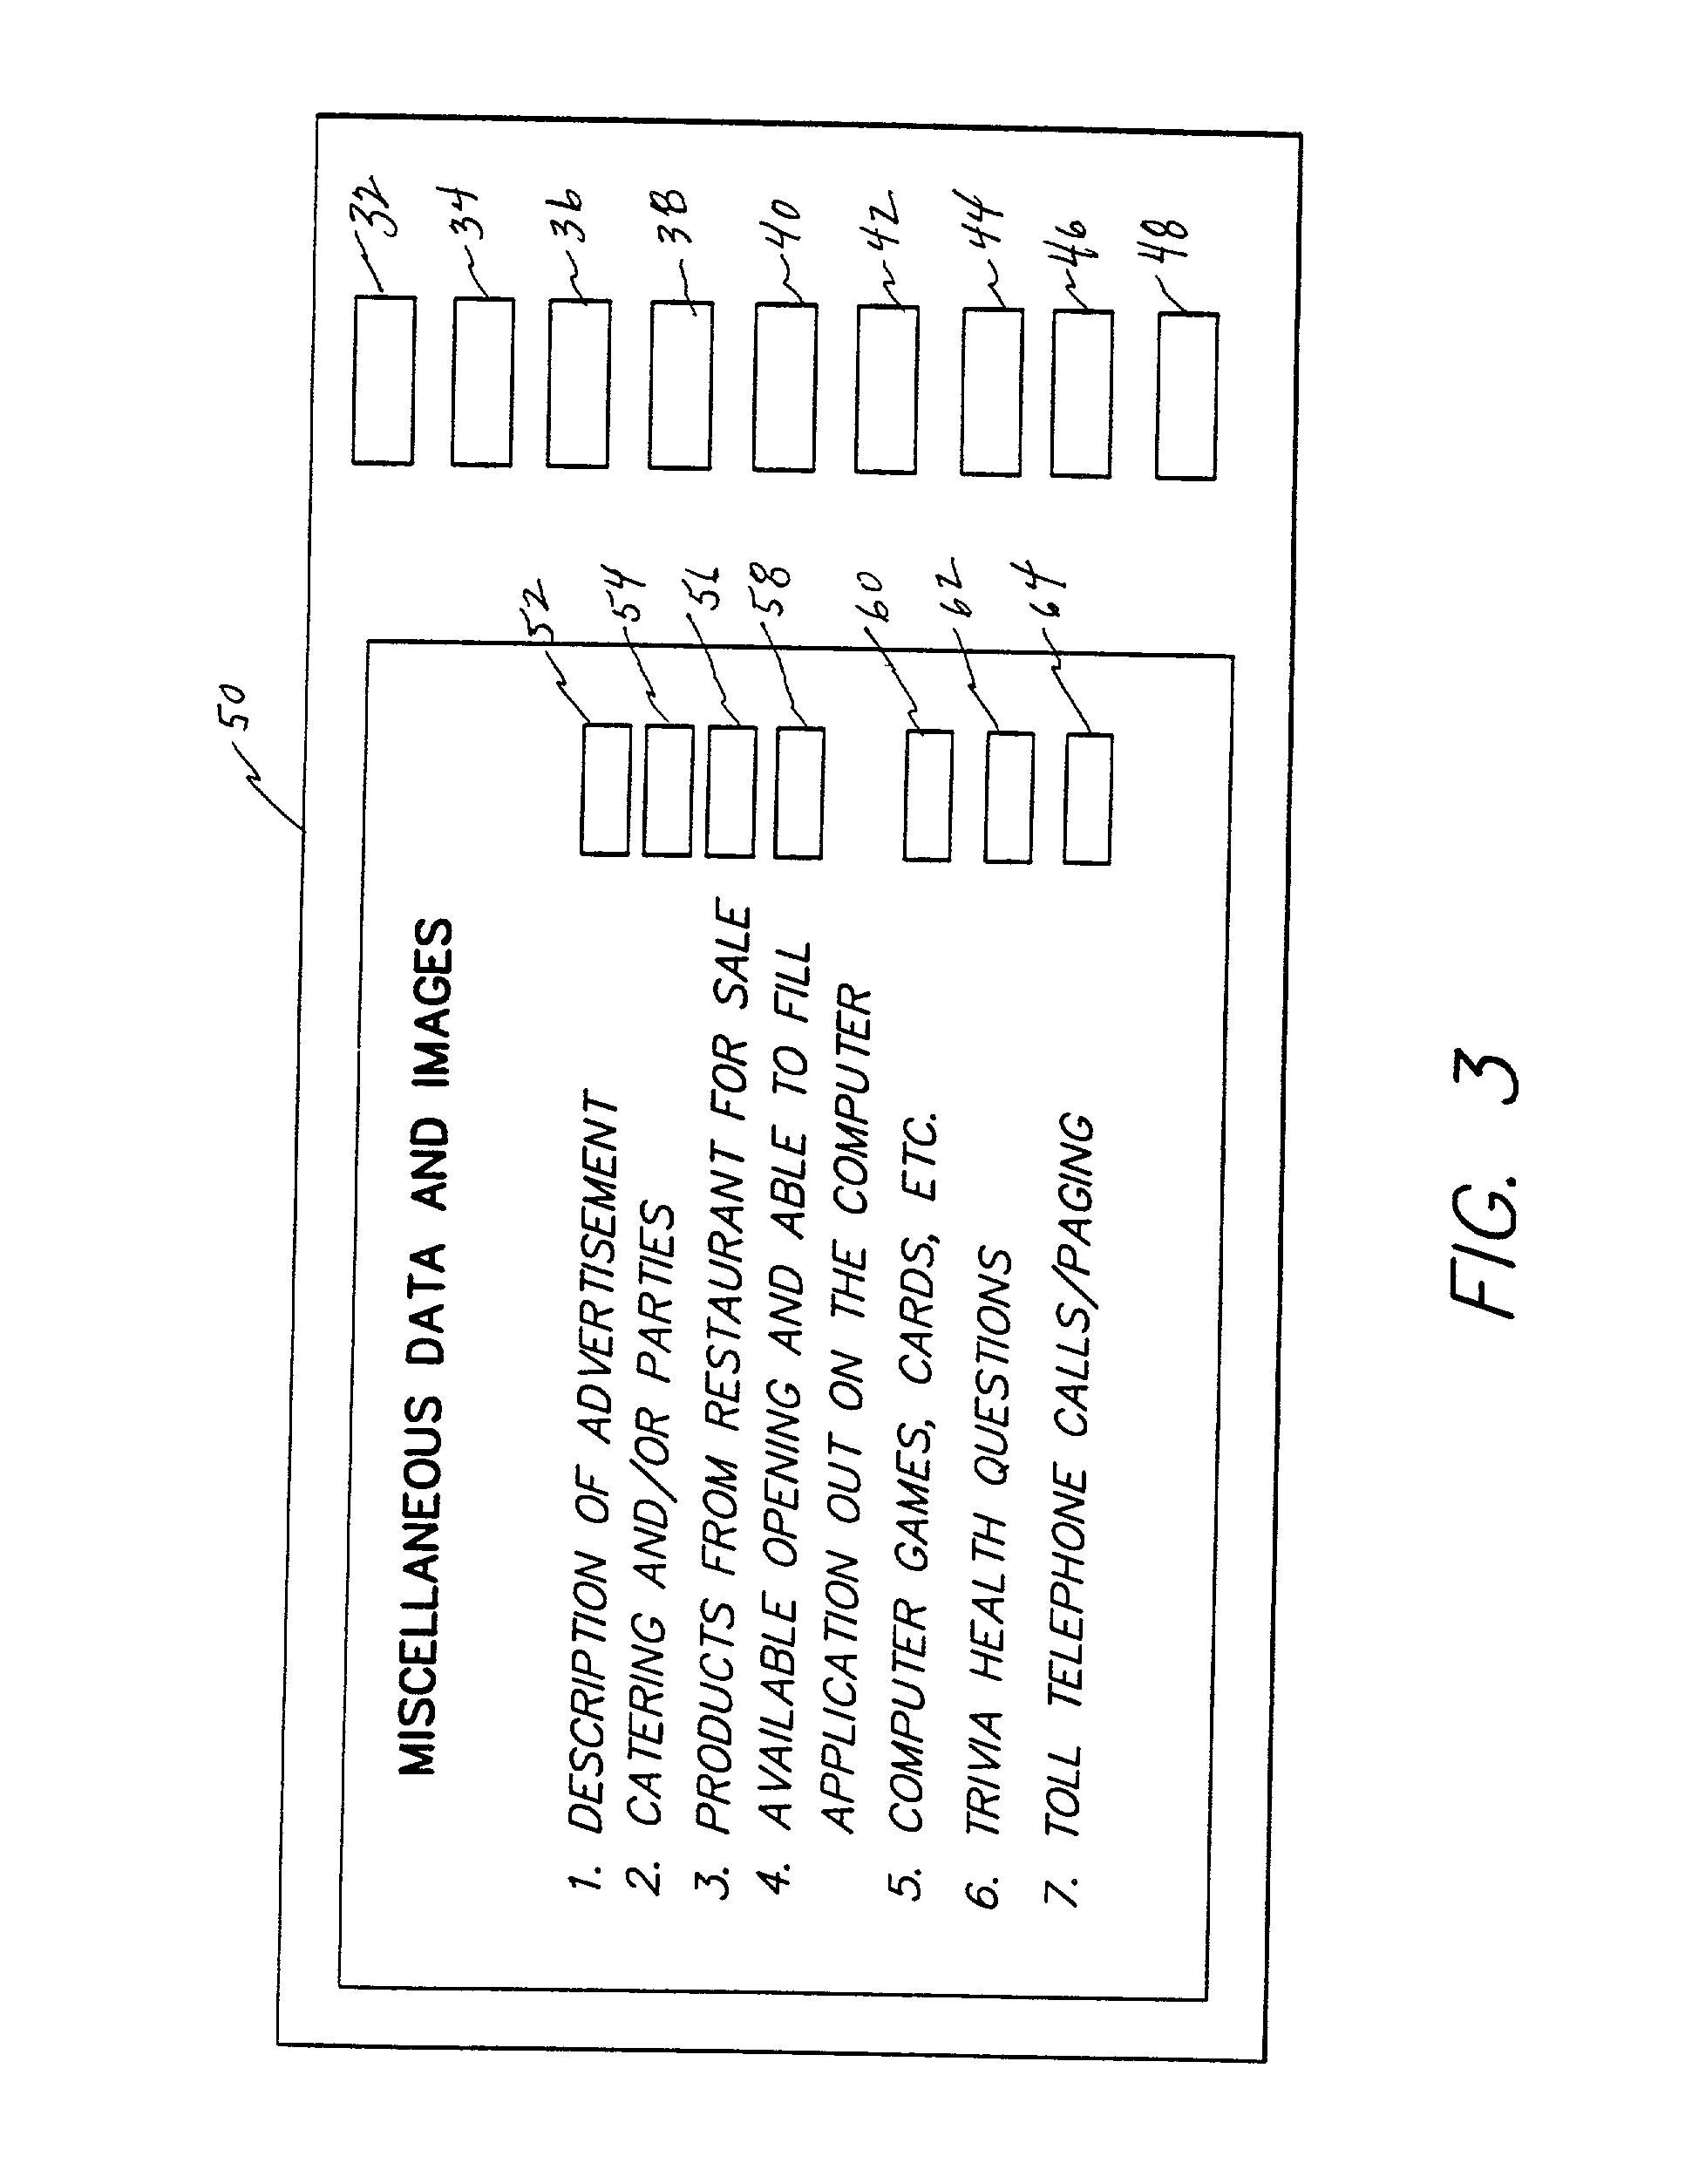 pacific intercom system wiring diagram florence intercom system wiring diagram